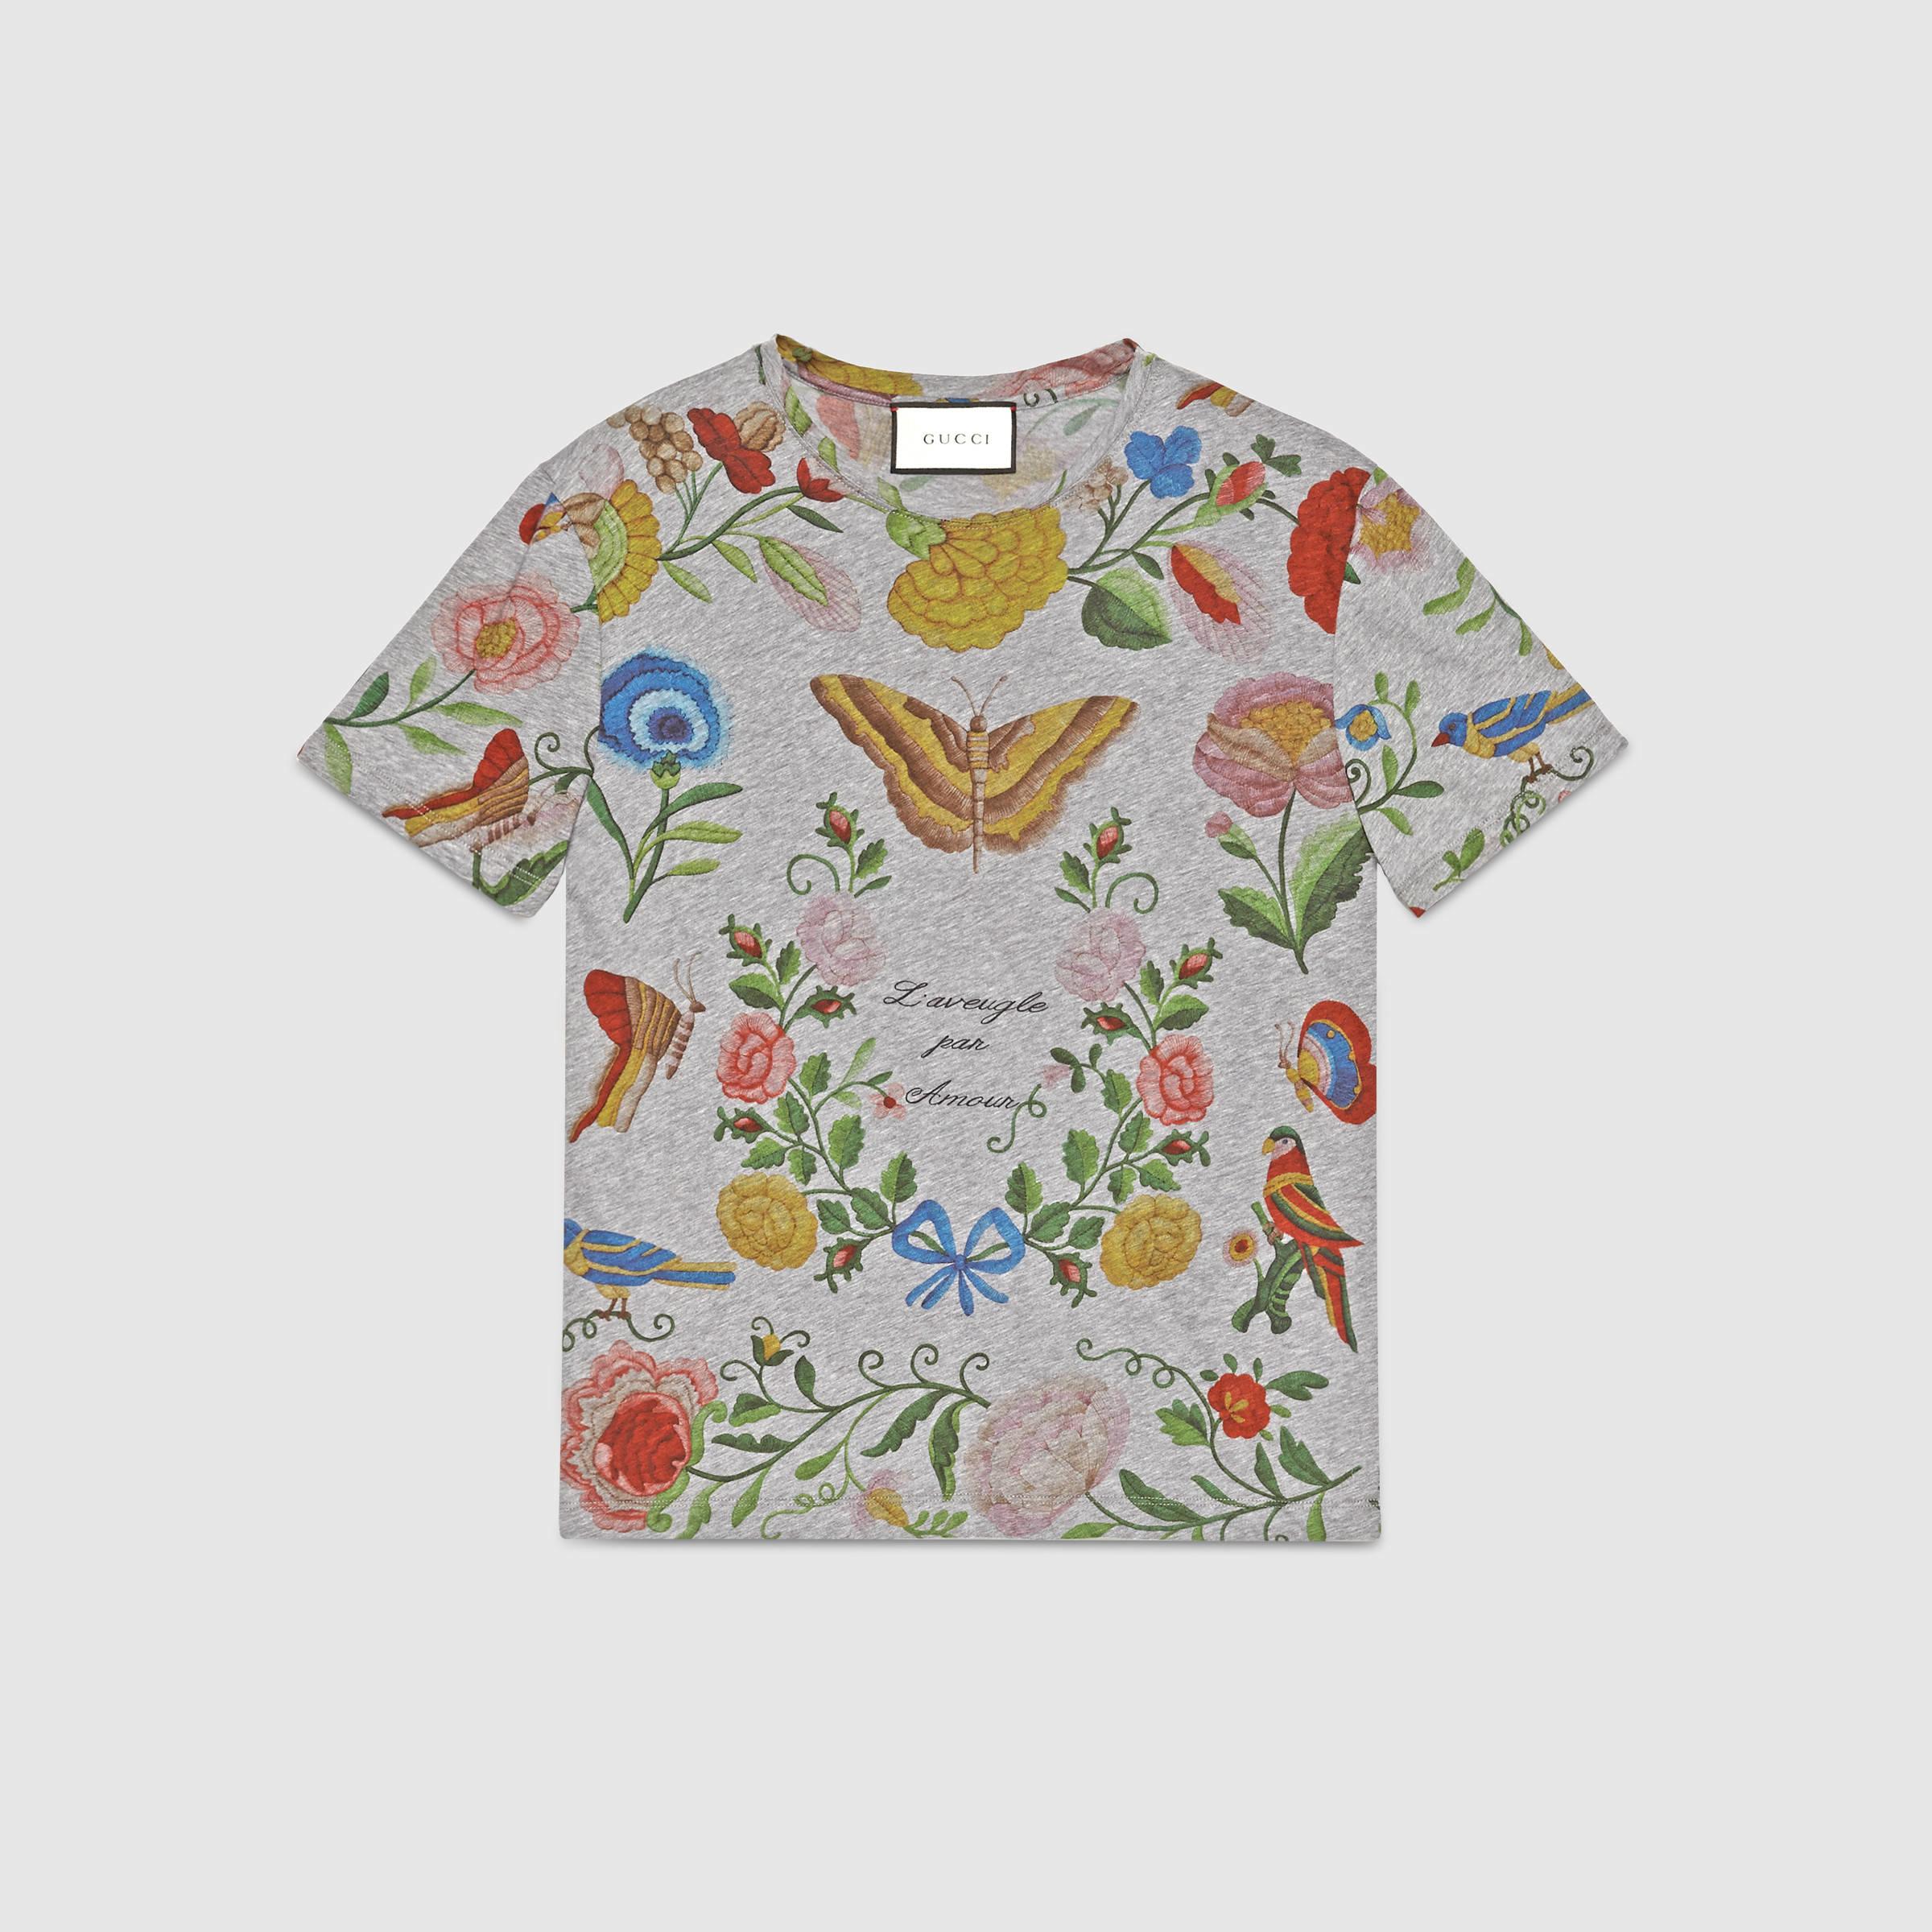 e68dfdf736b8f Gallery. Men s Logo T Shirts Men s Striped Tanks Men s Soccer Tops ...